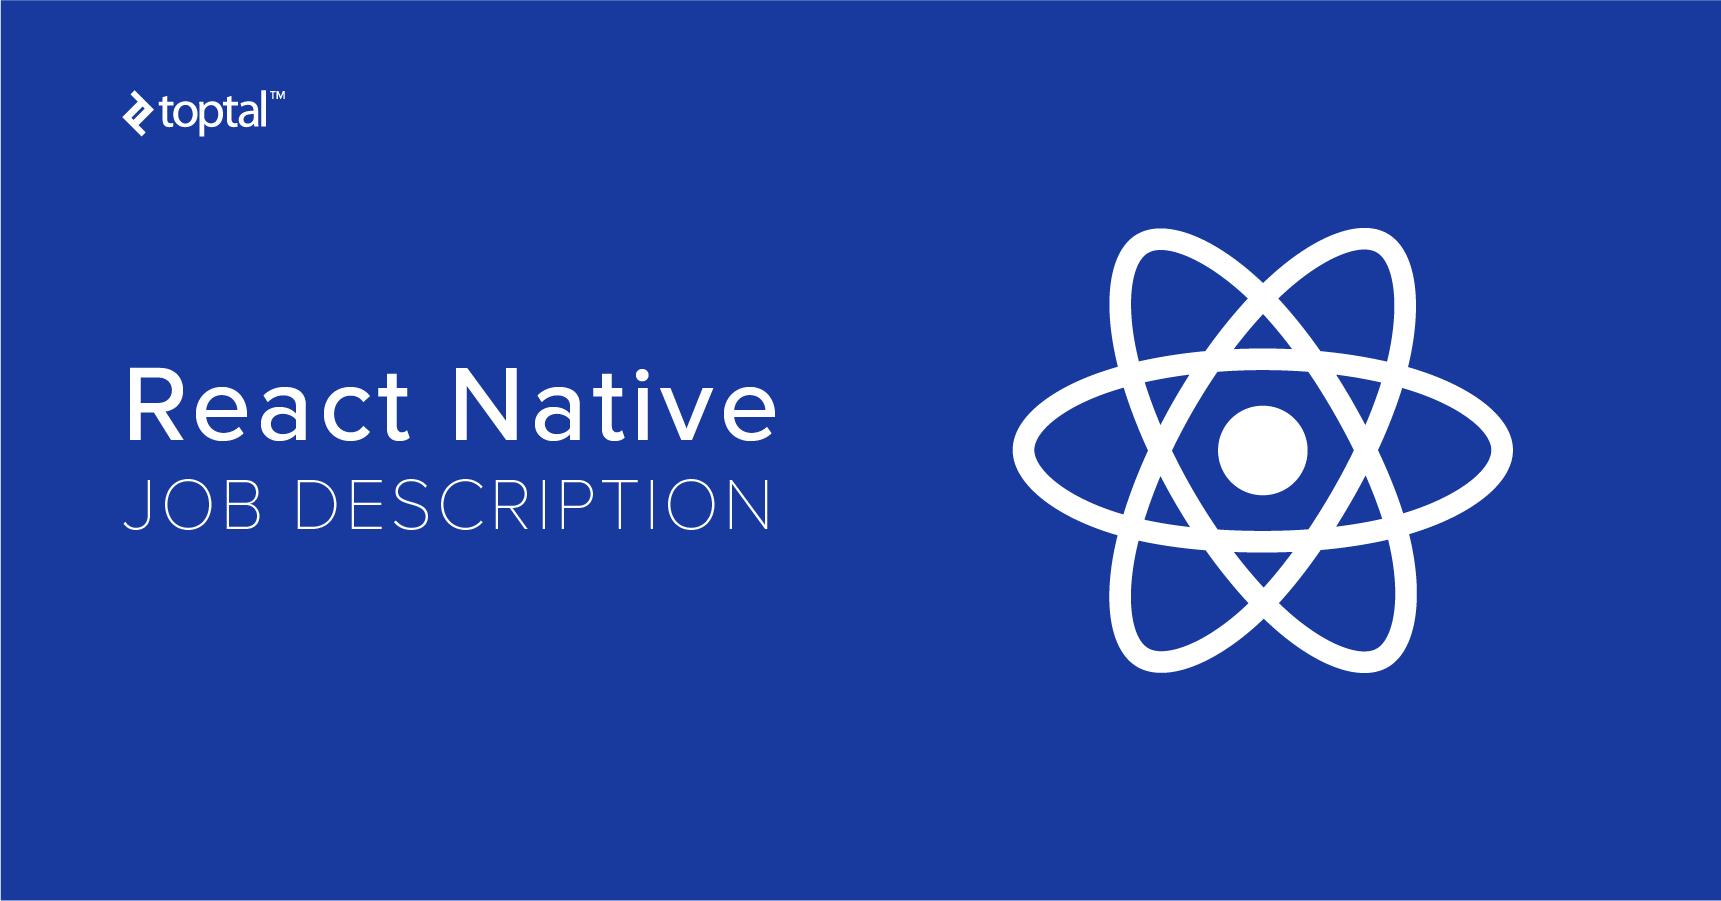 React Native Developer Job Description Template | Toptal®